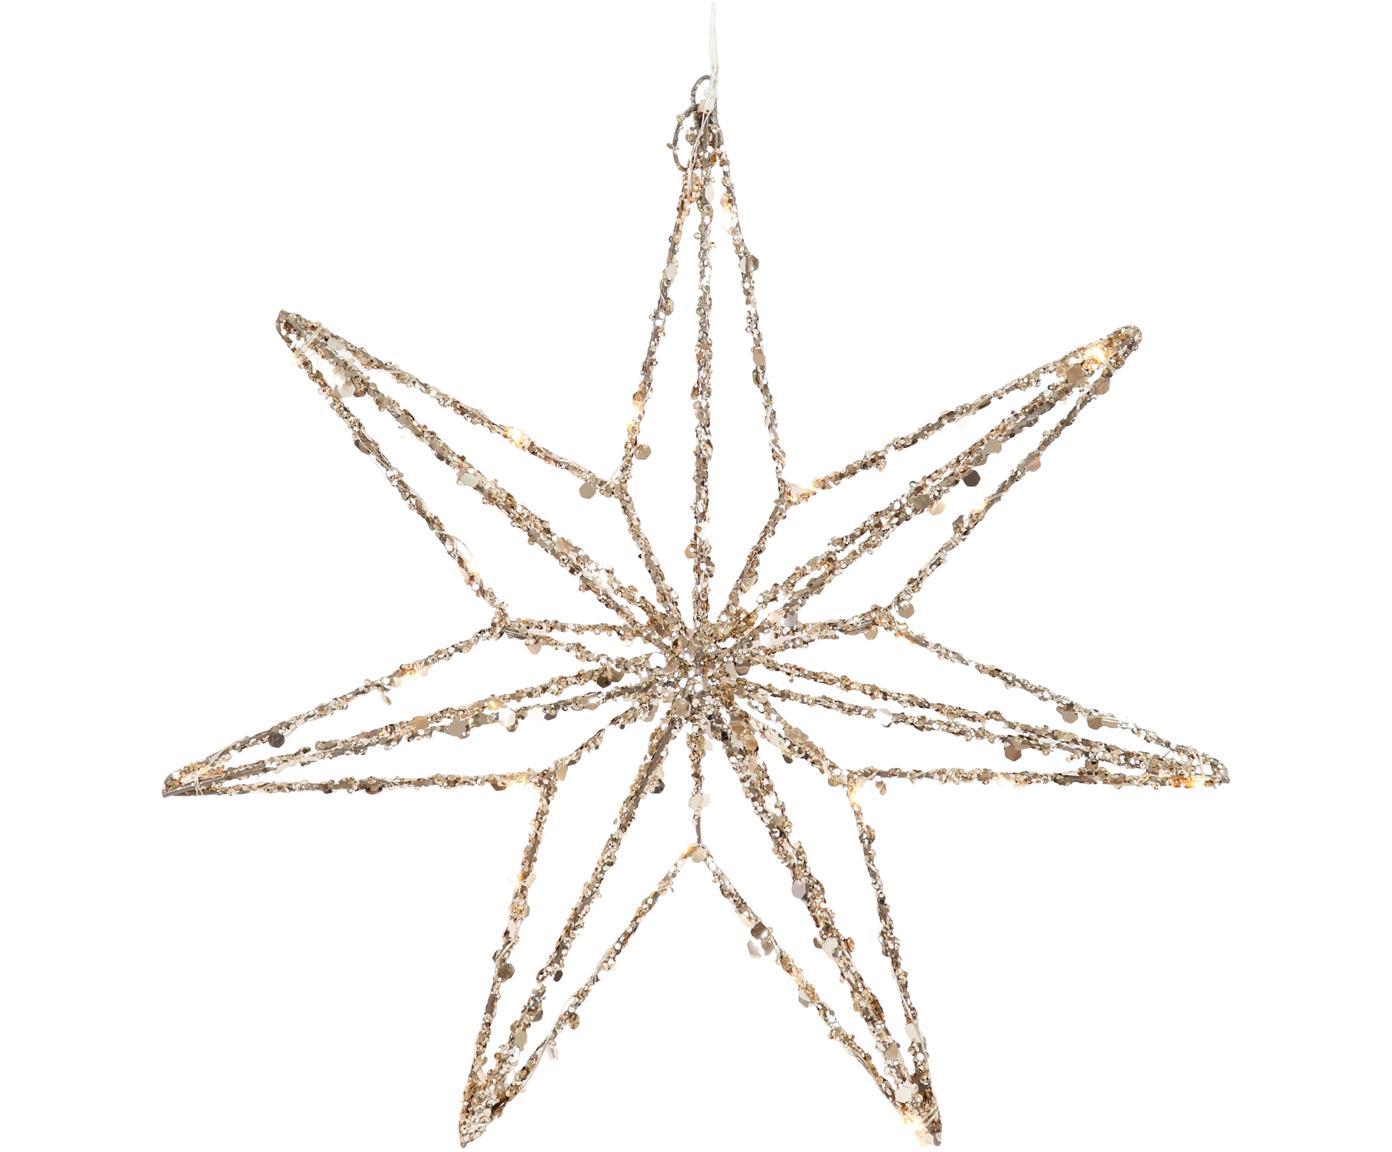 LED Leuchtstern Illumination, Metall, Kunststoff, Goldfarben, Ø 40 x H 8 cm